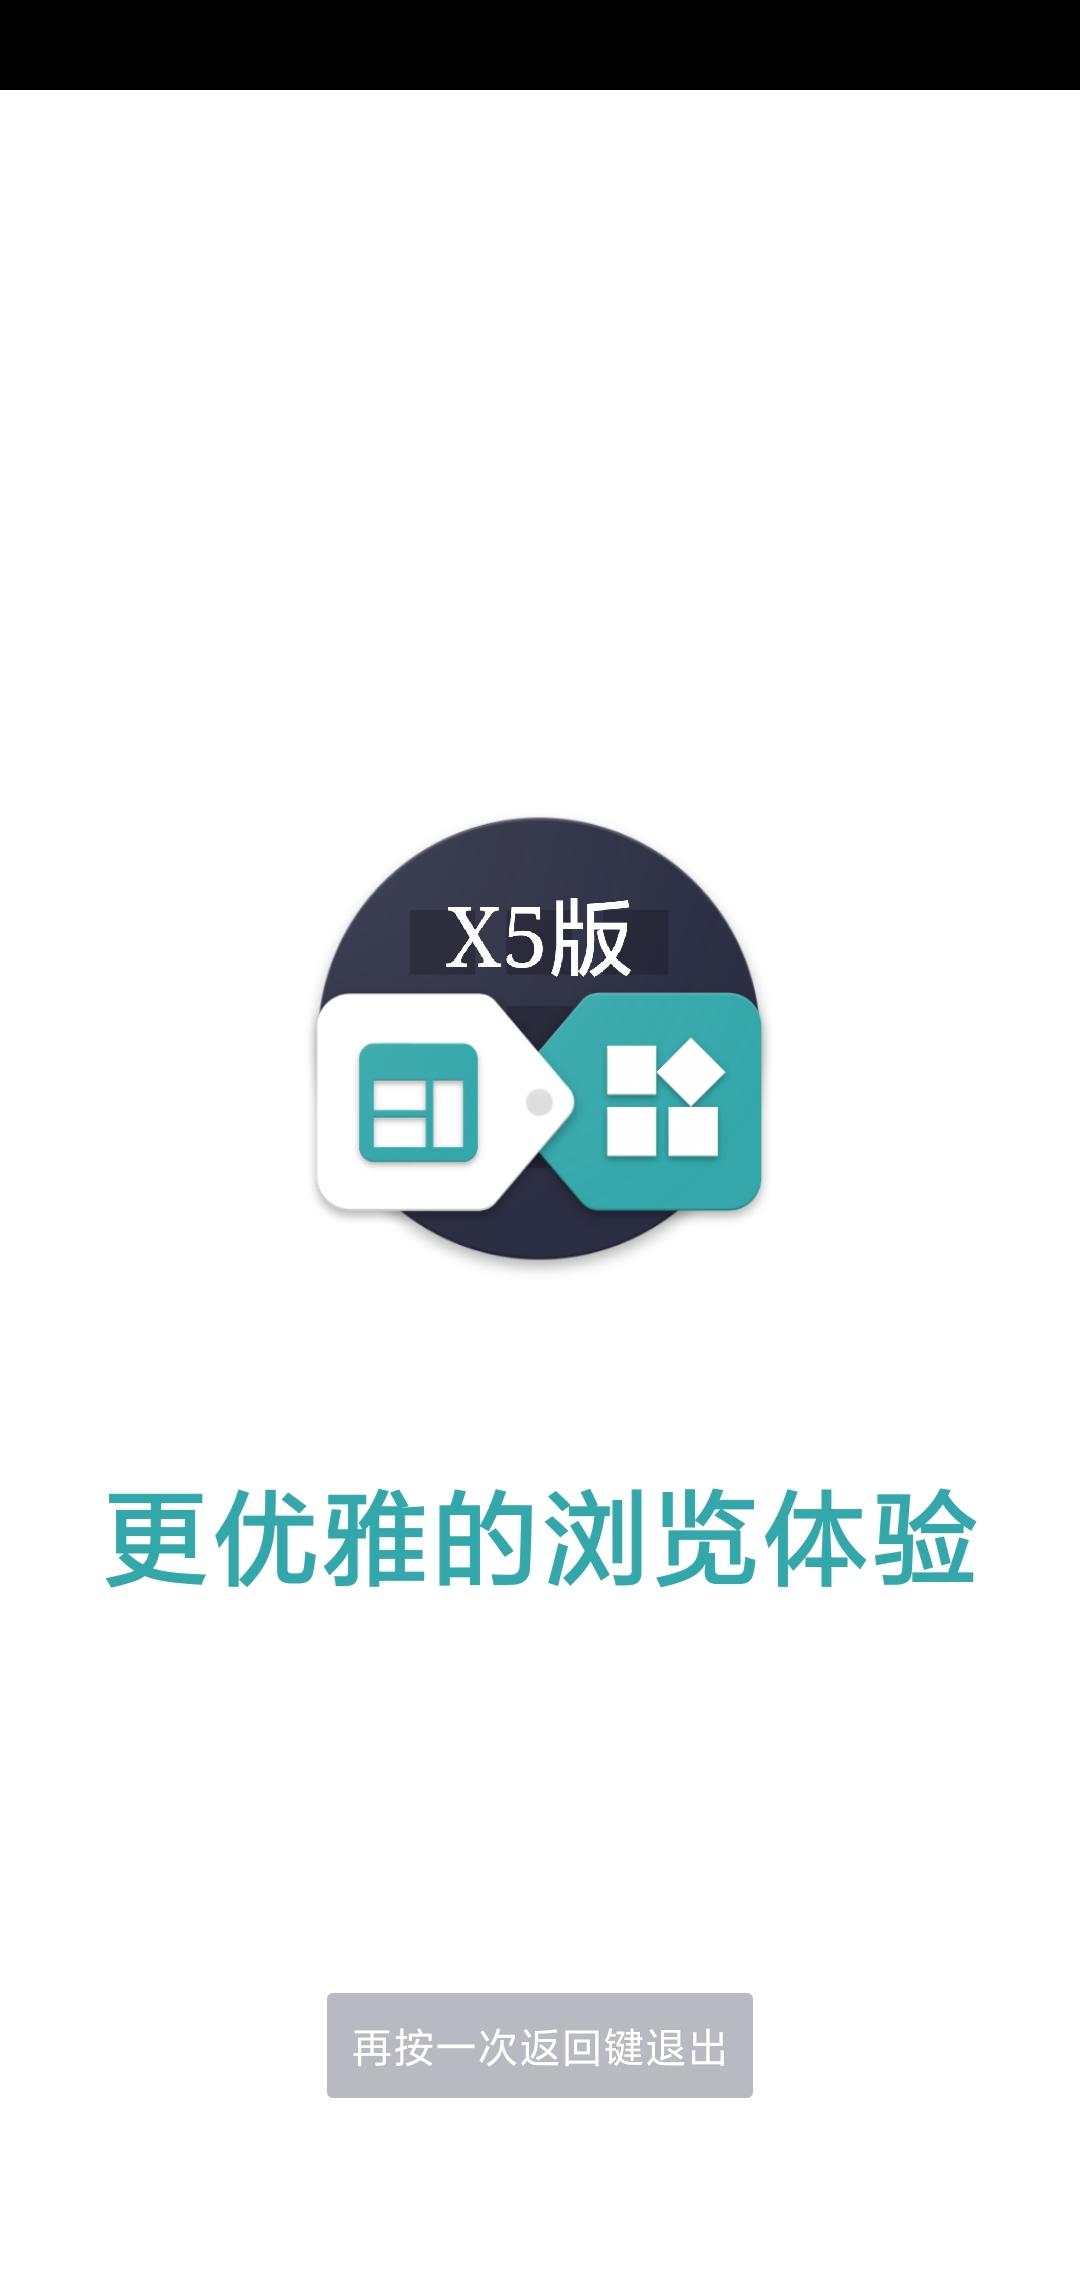 Fusion app x5内核版